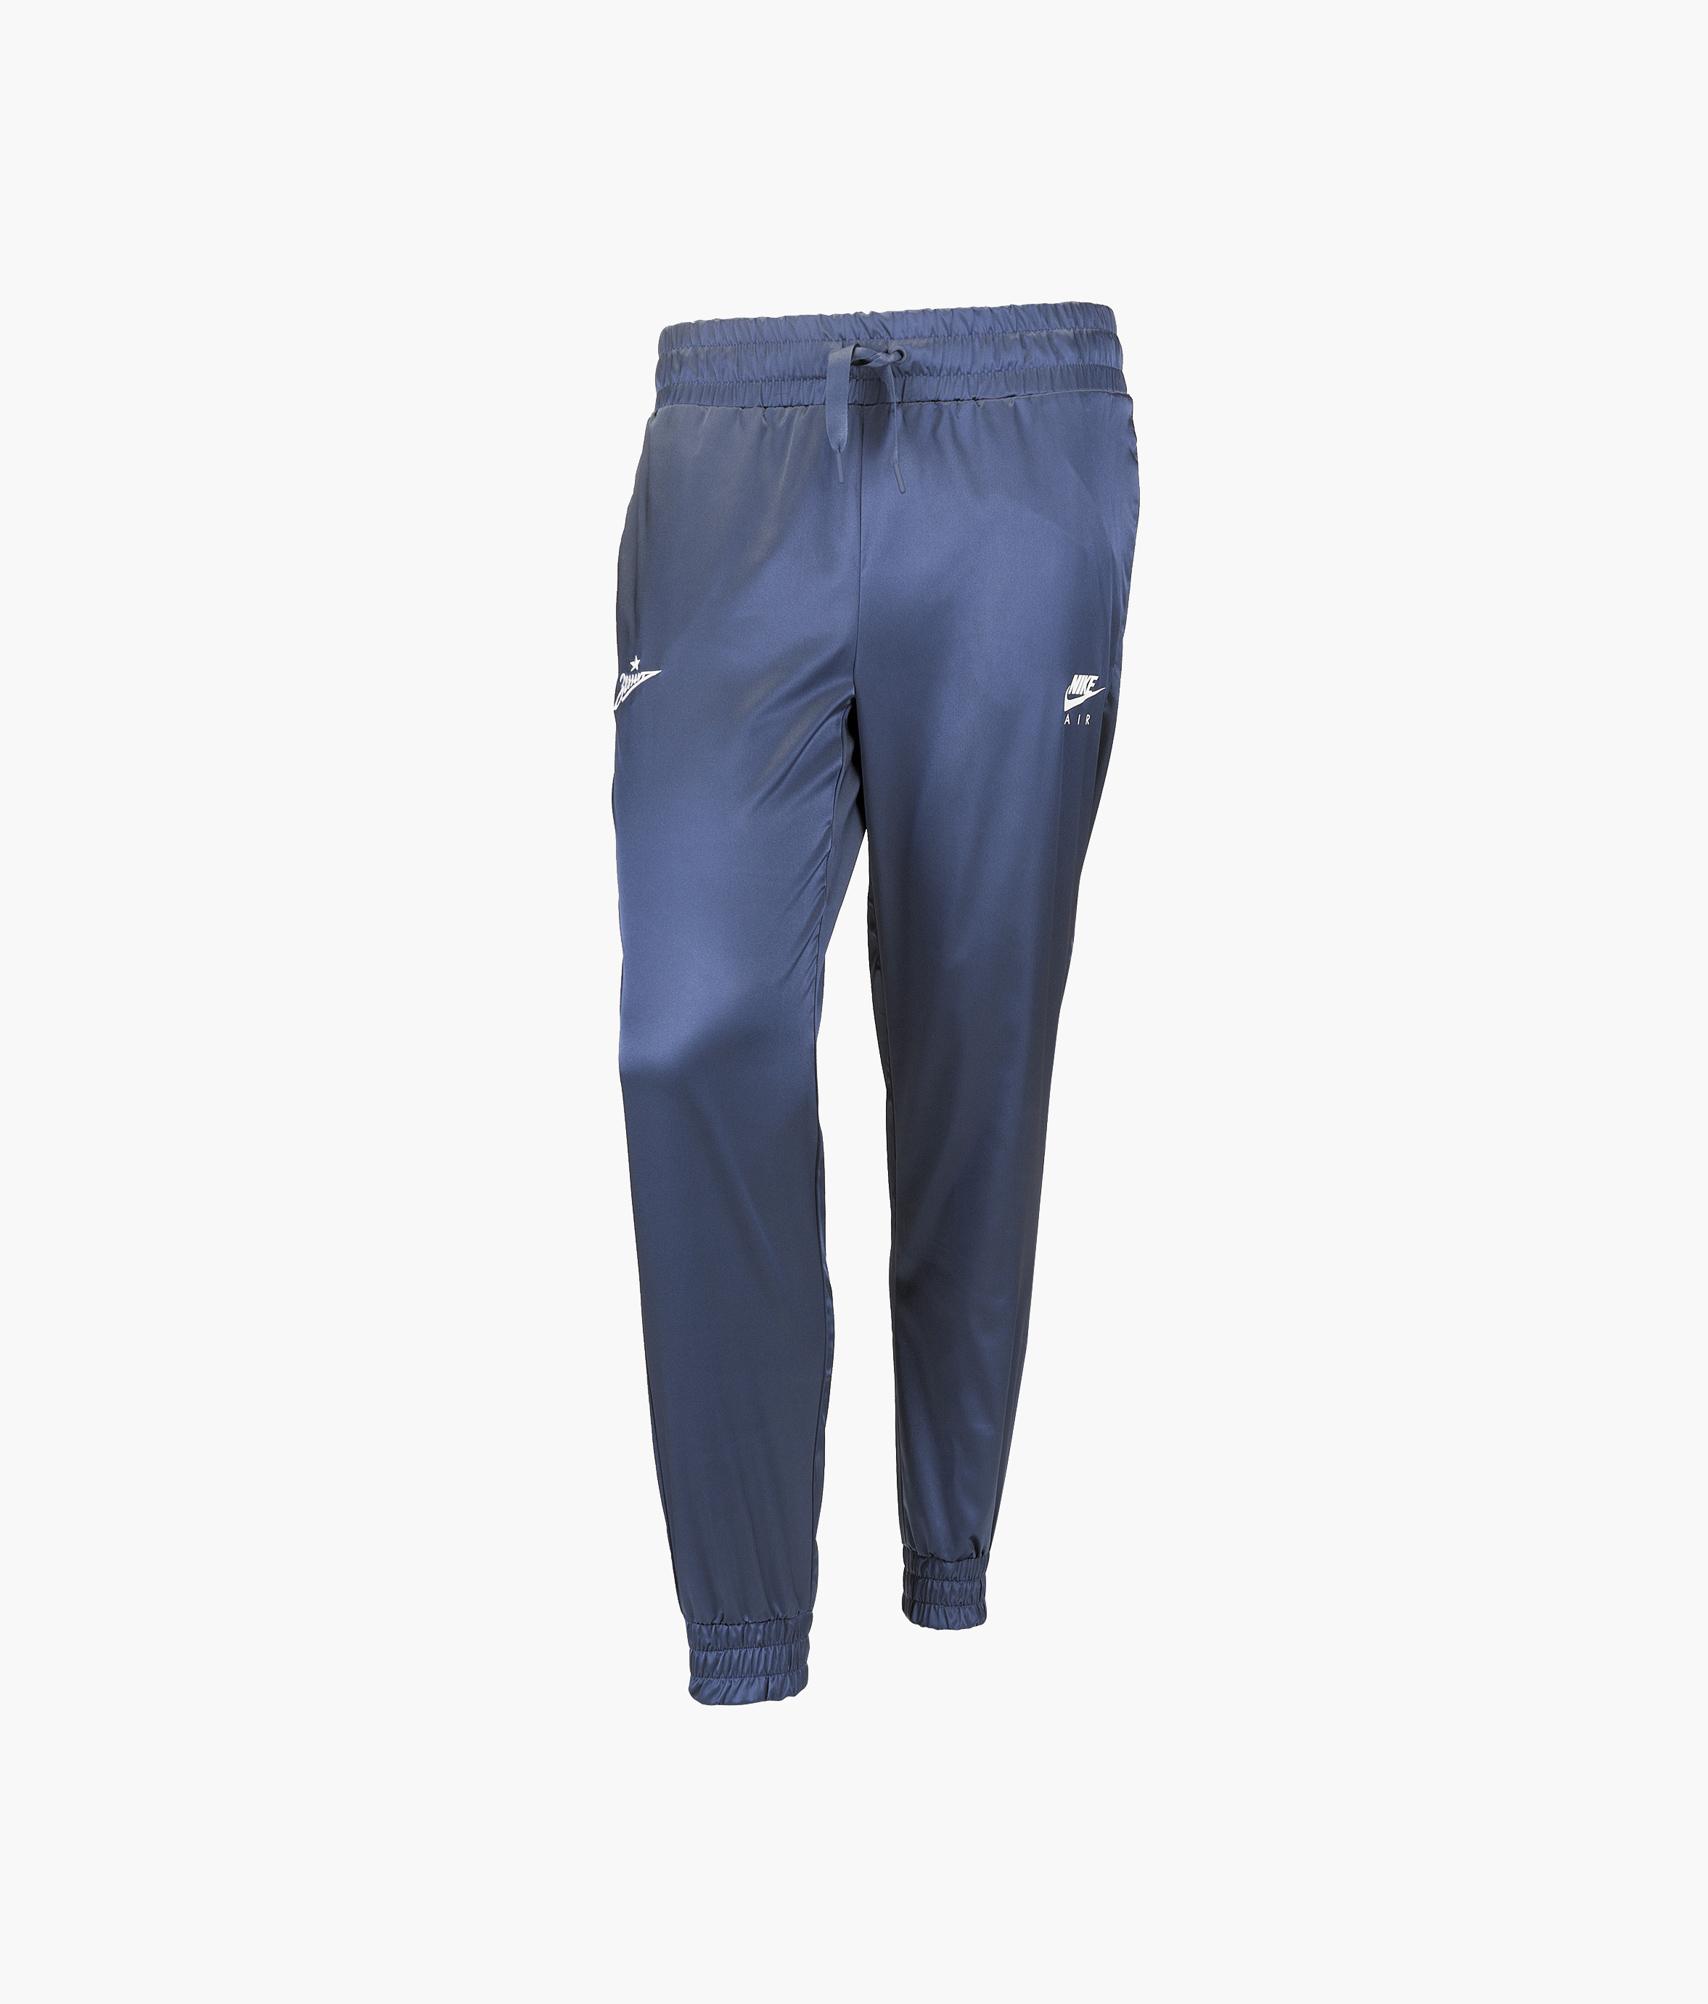 Брюки женские Nike Nike Цвет-Синий